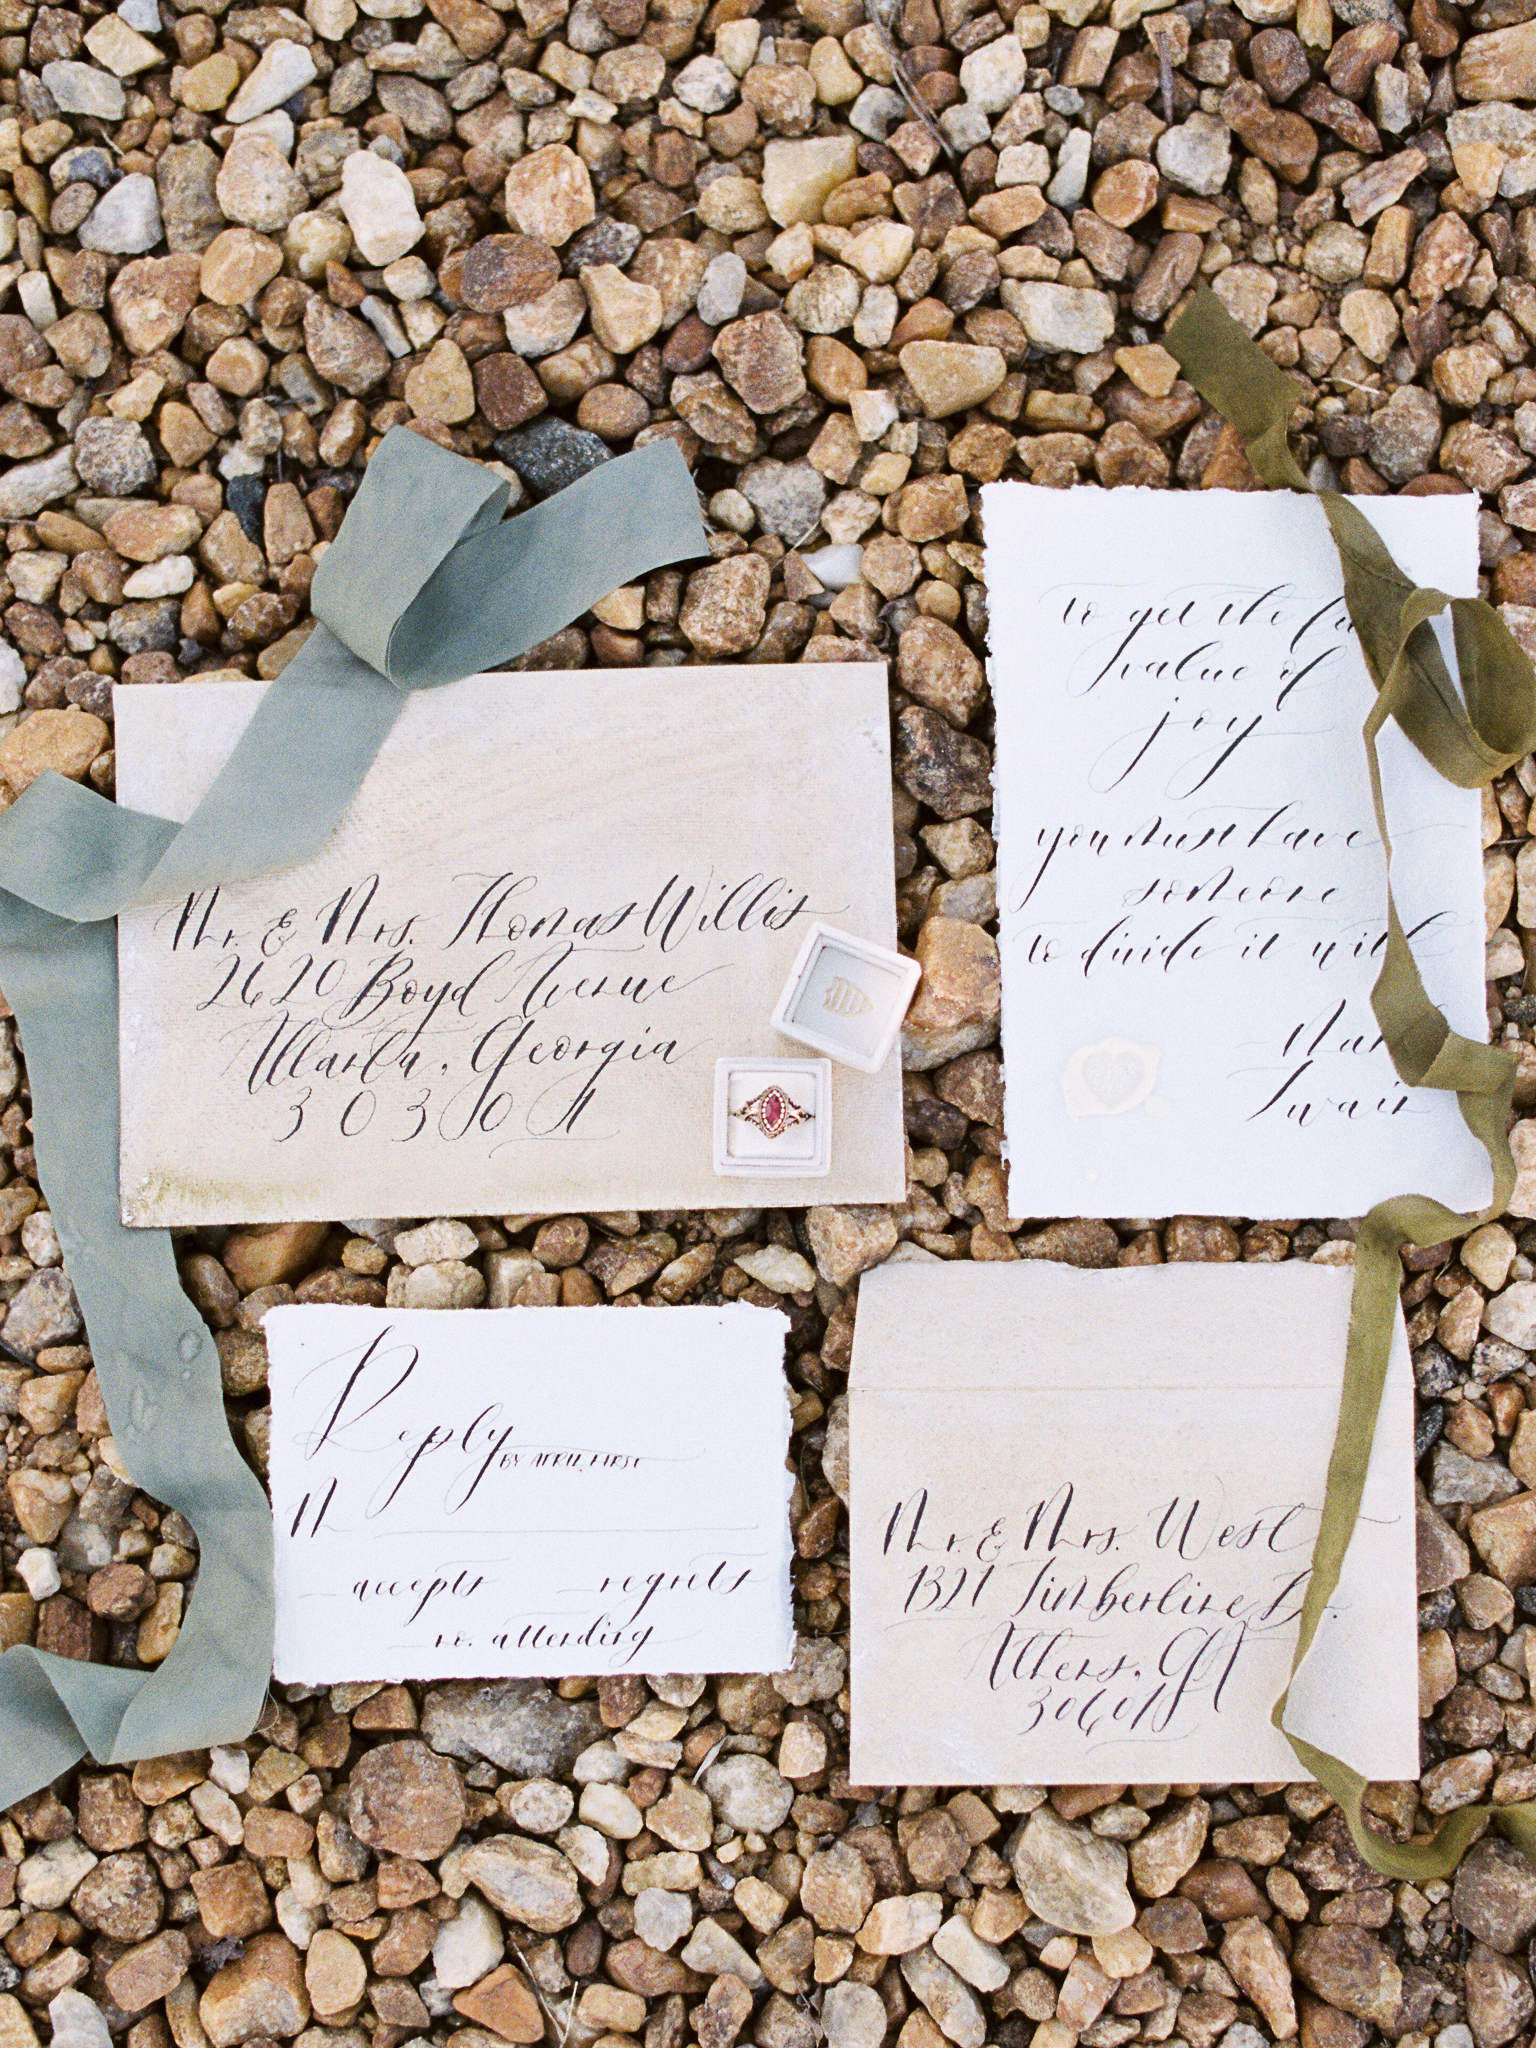 christinadavis+weddinginspiration38.jpg